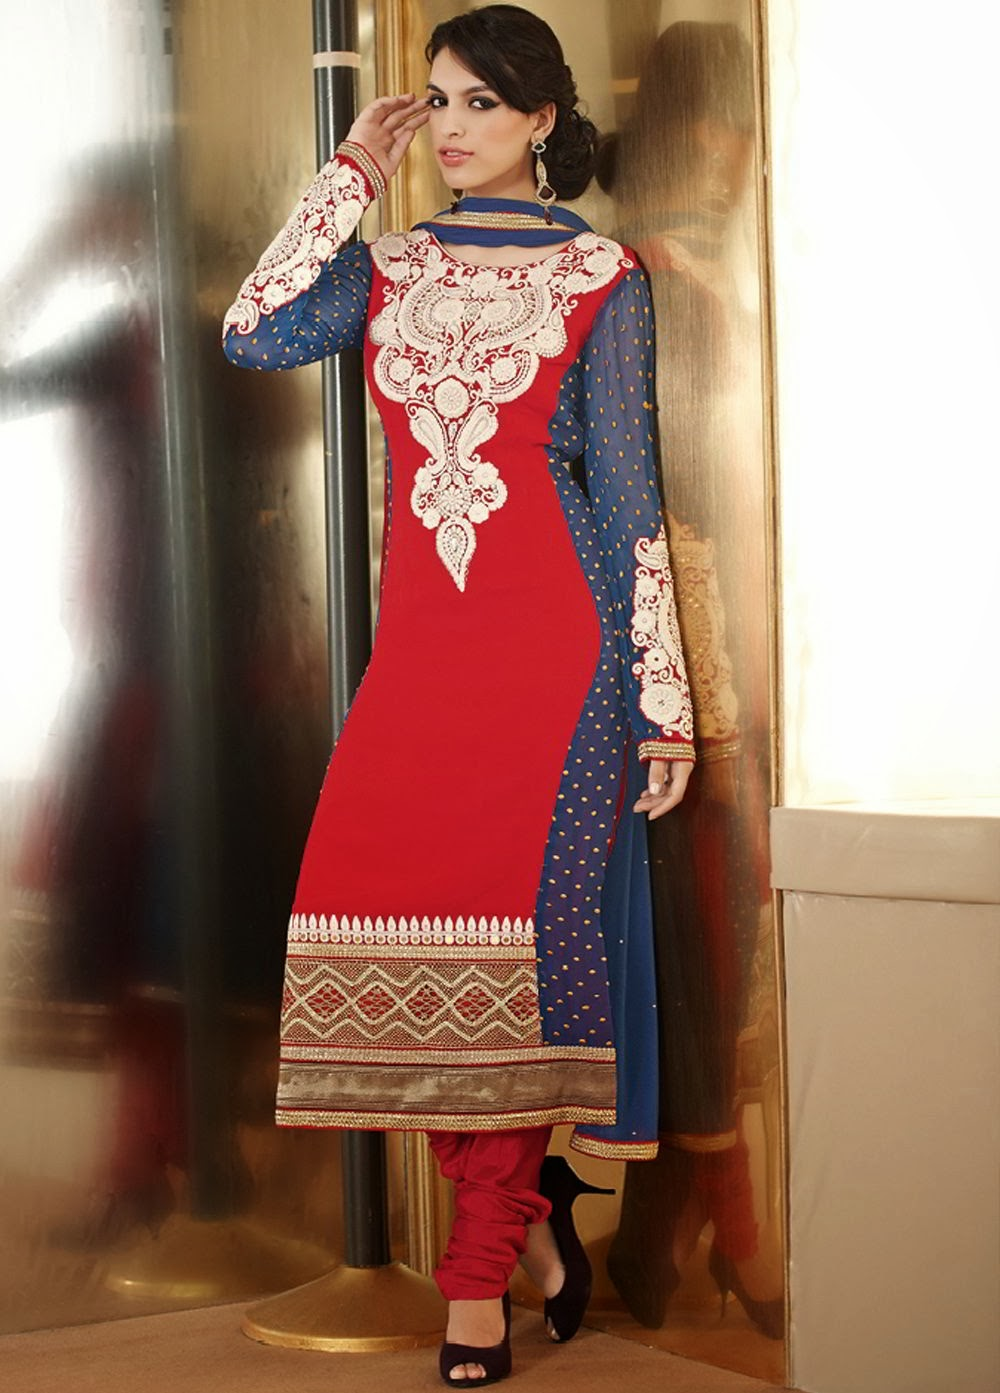 Stylish Anarkali Salwar Kameez Suits 2014 - Fashion Me Now